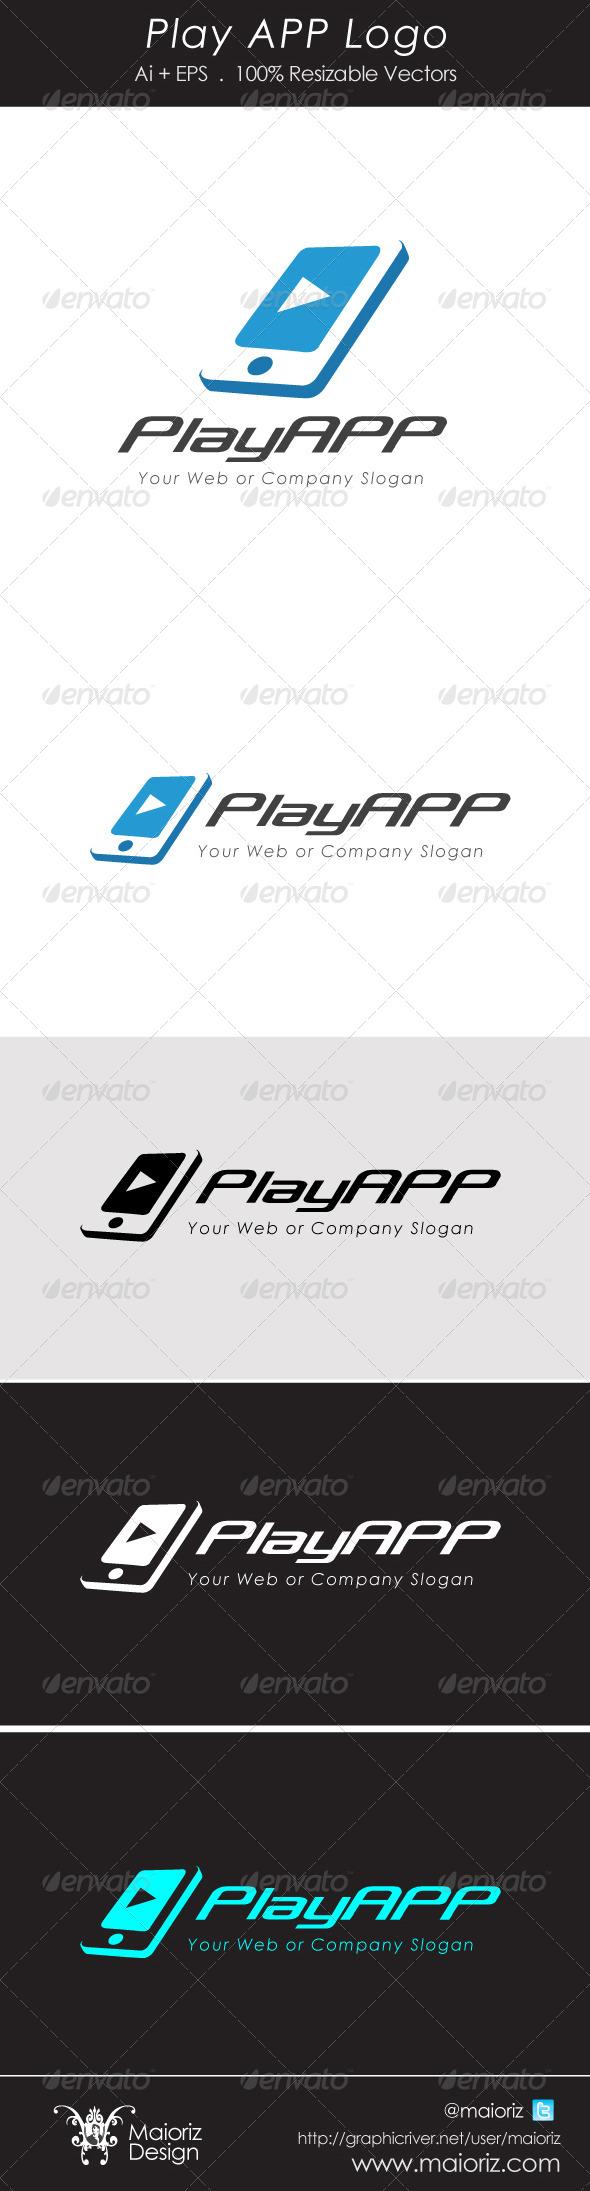 Play App Logotype - Objects Logo Templates